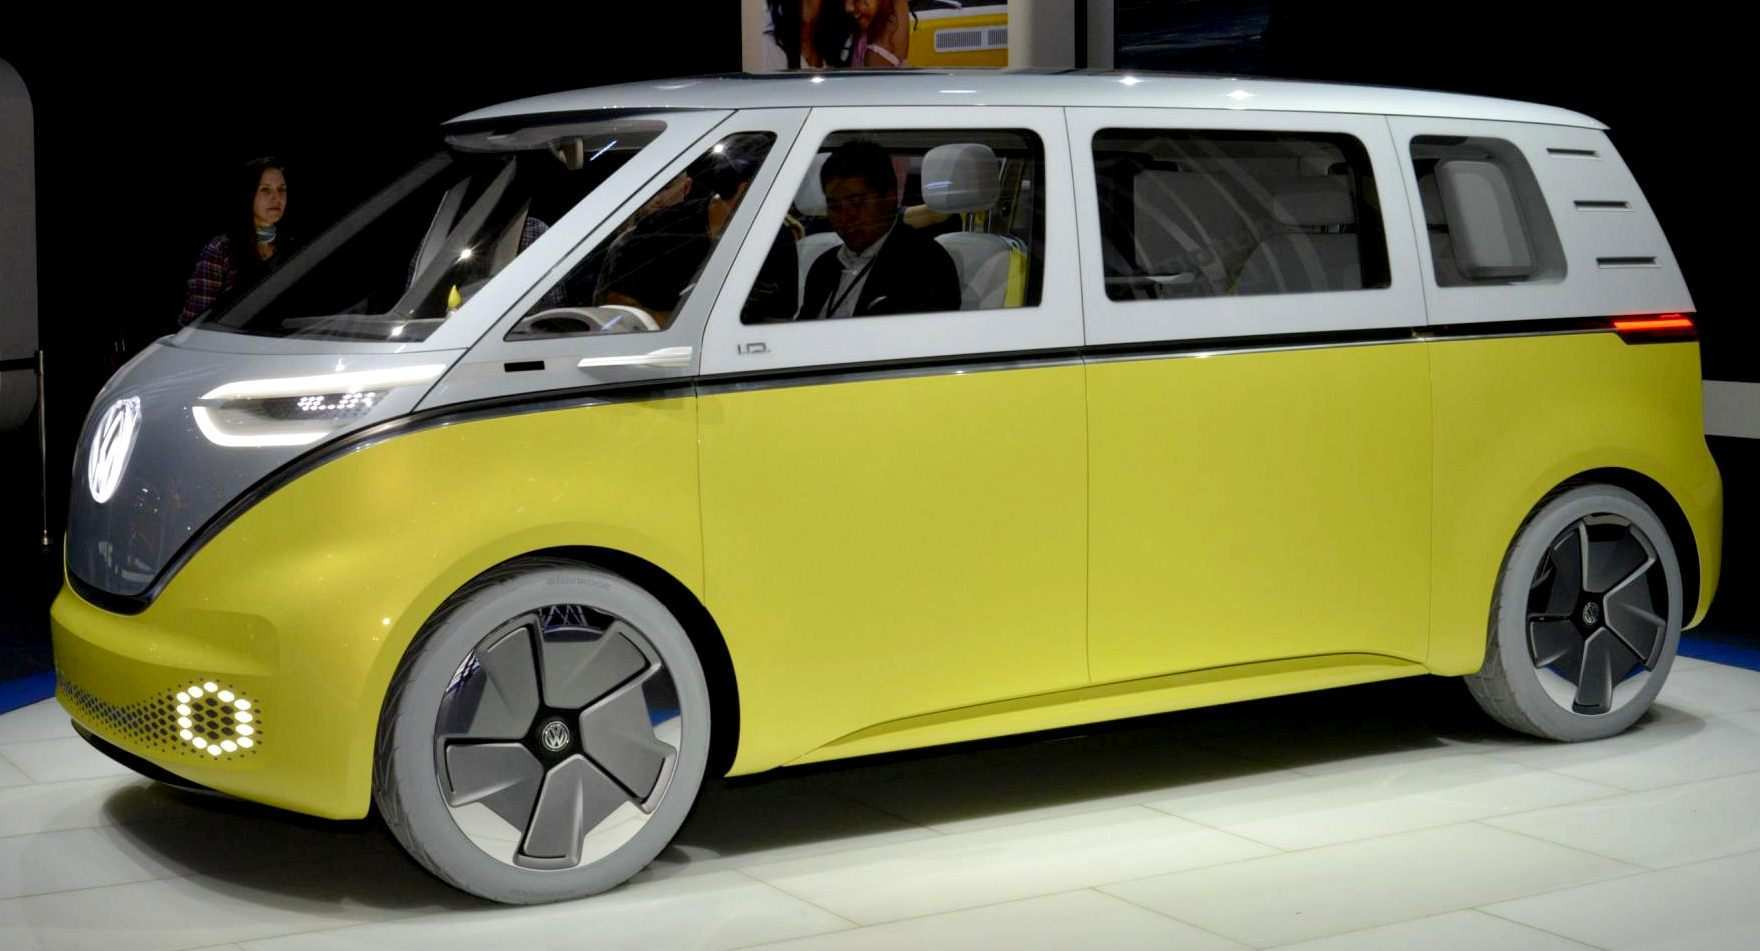 37 New Volkswagen Camper 2020 Style by Volkswagen Camper 2020